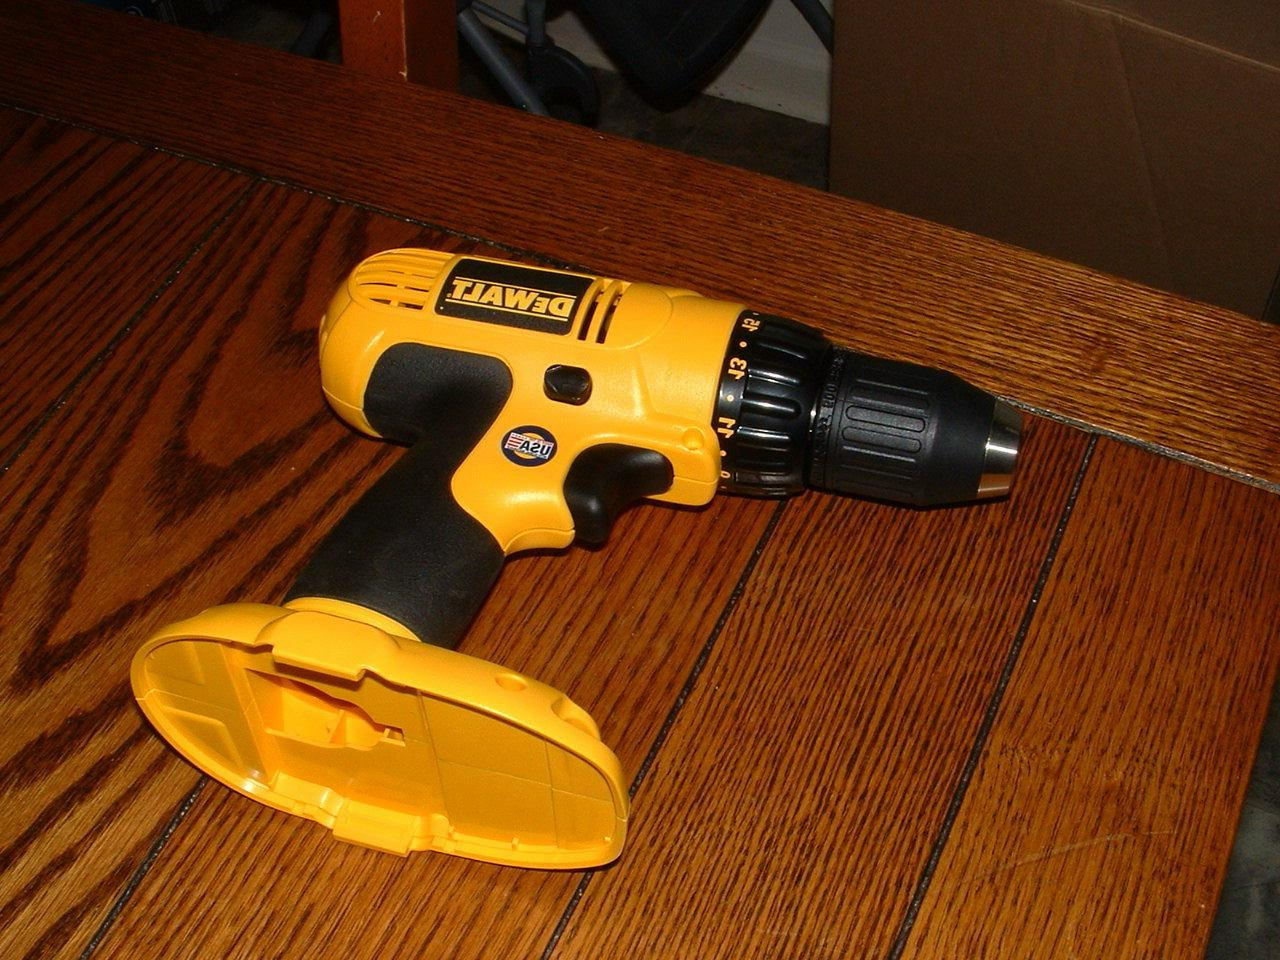 new 18v dc759 1 2 drill driver